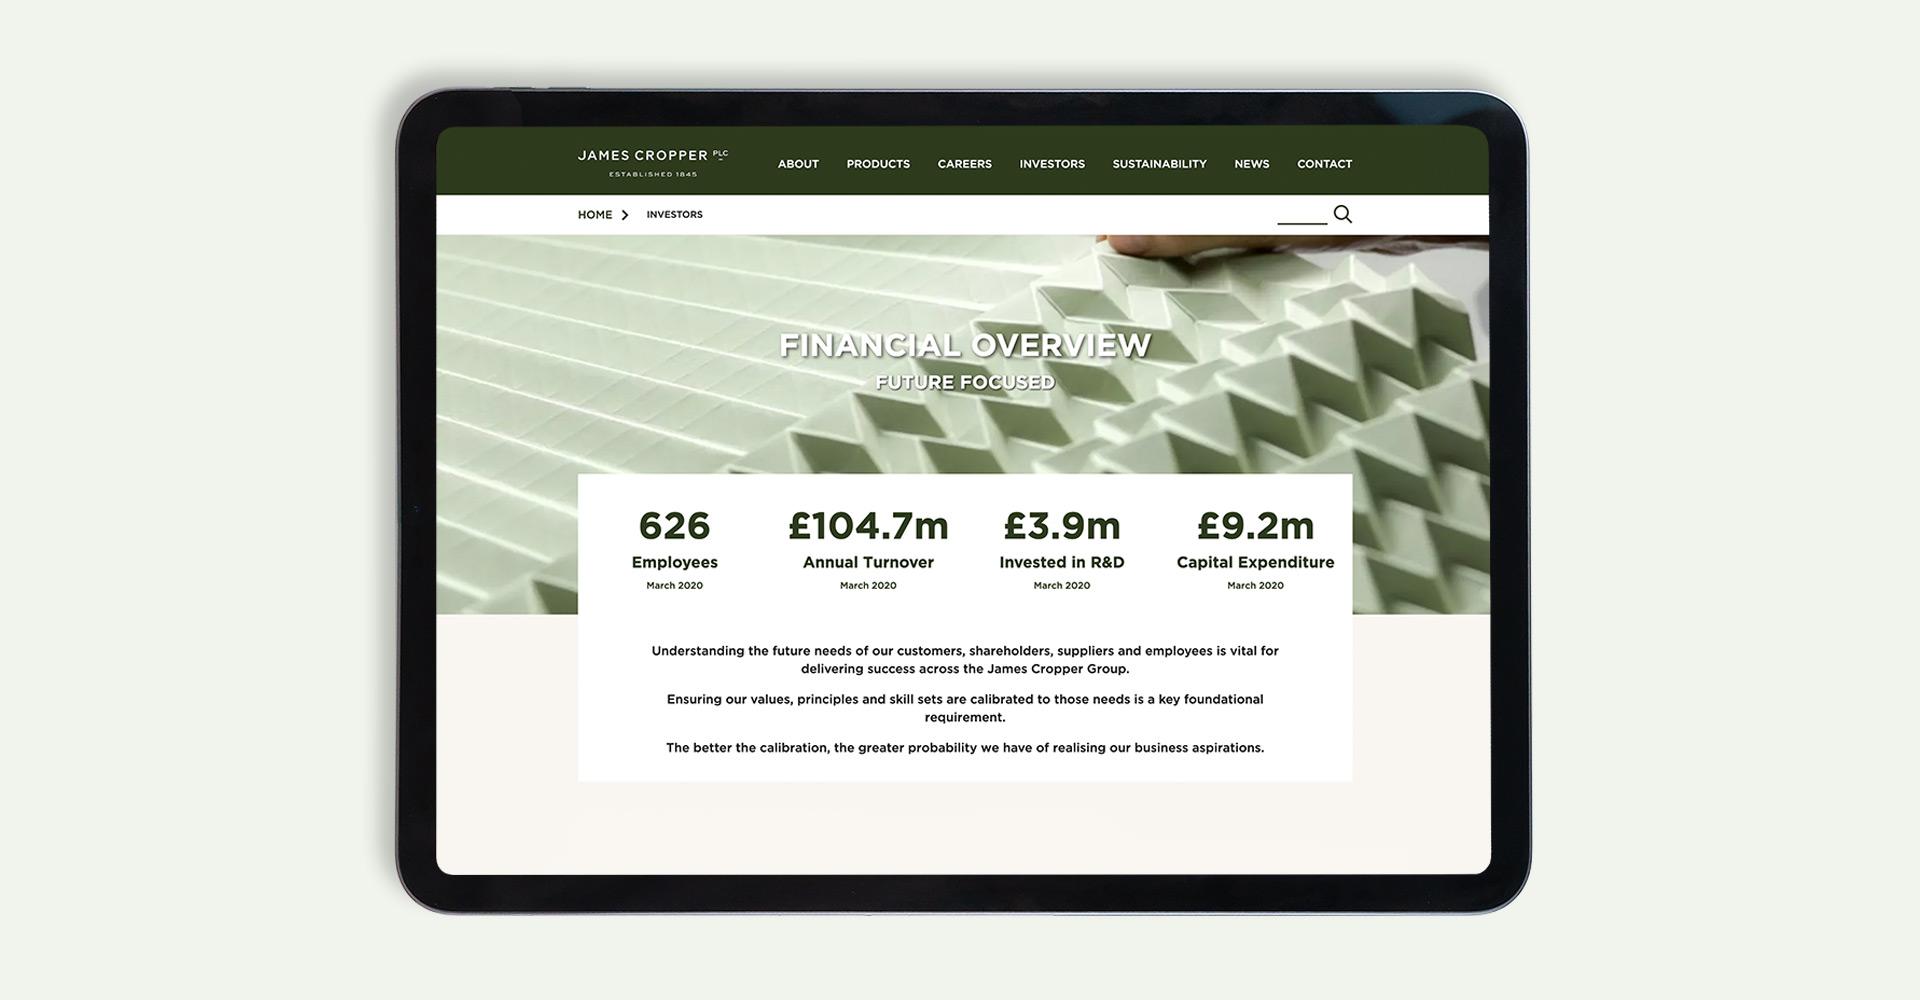 Plain Creative Project - James Cropper PLC Website financial overview page